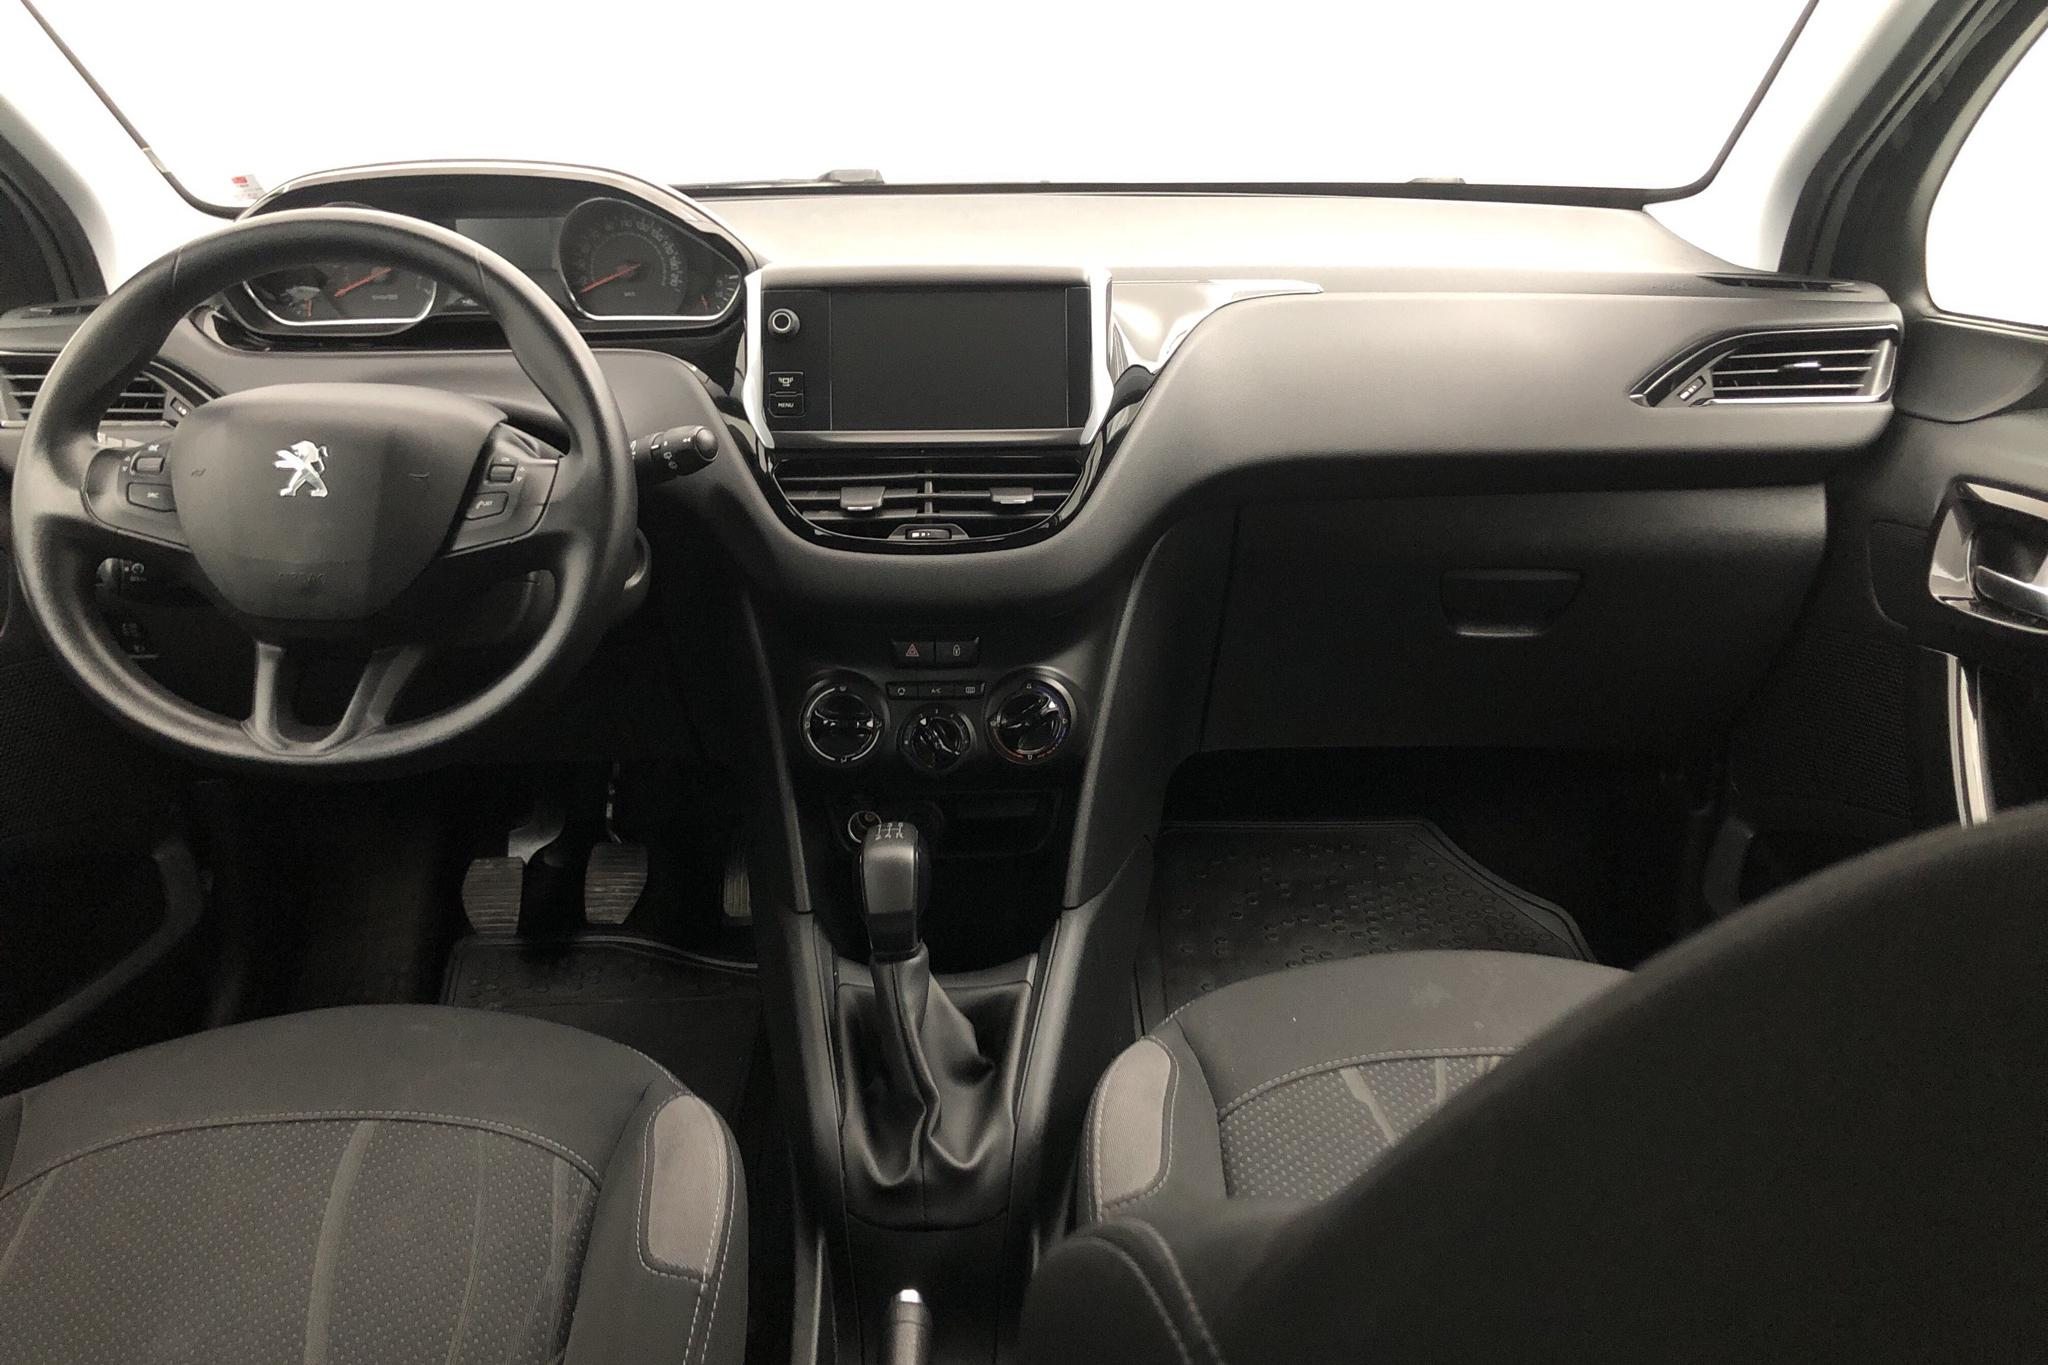 Peugeot 208 1.2 VTi 5dr (82hk) - 63 890 km - Manual - Dark Grey - 2013